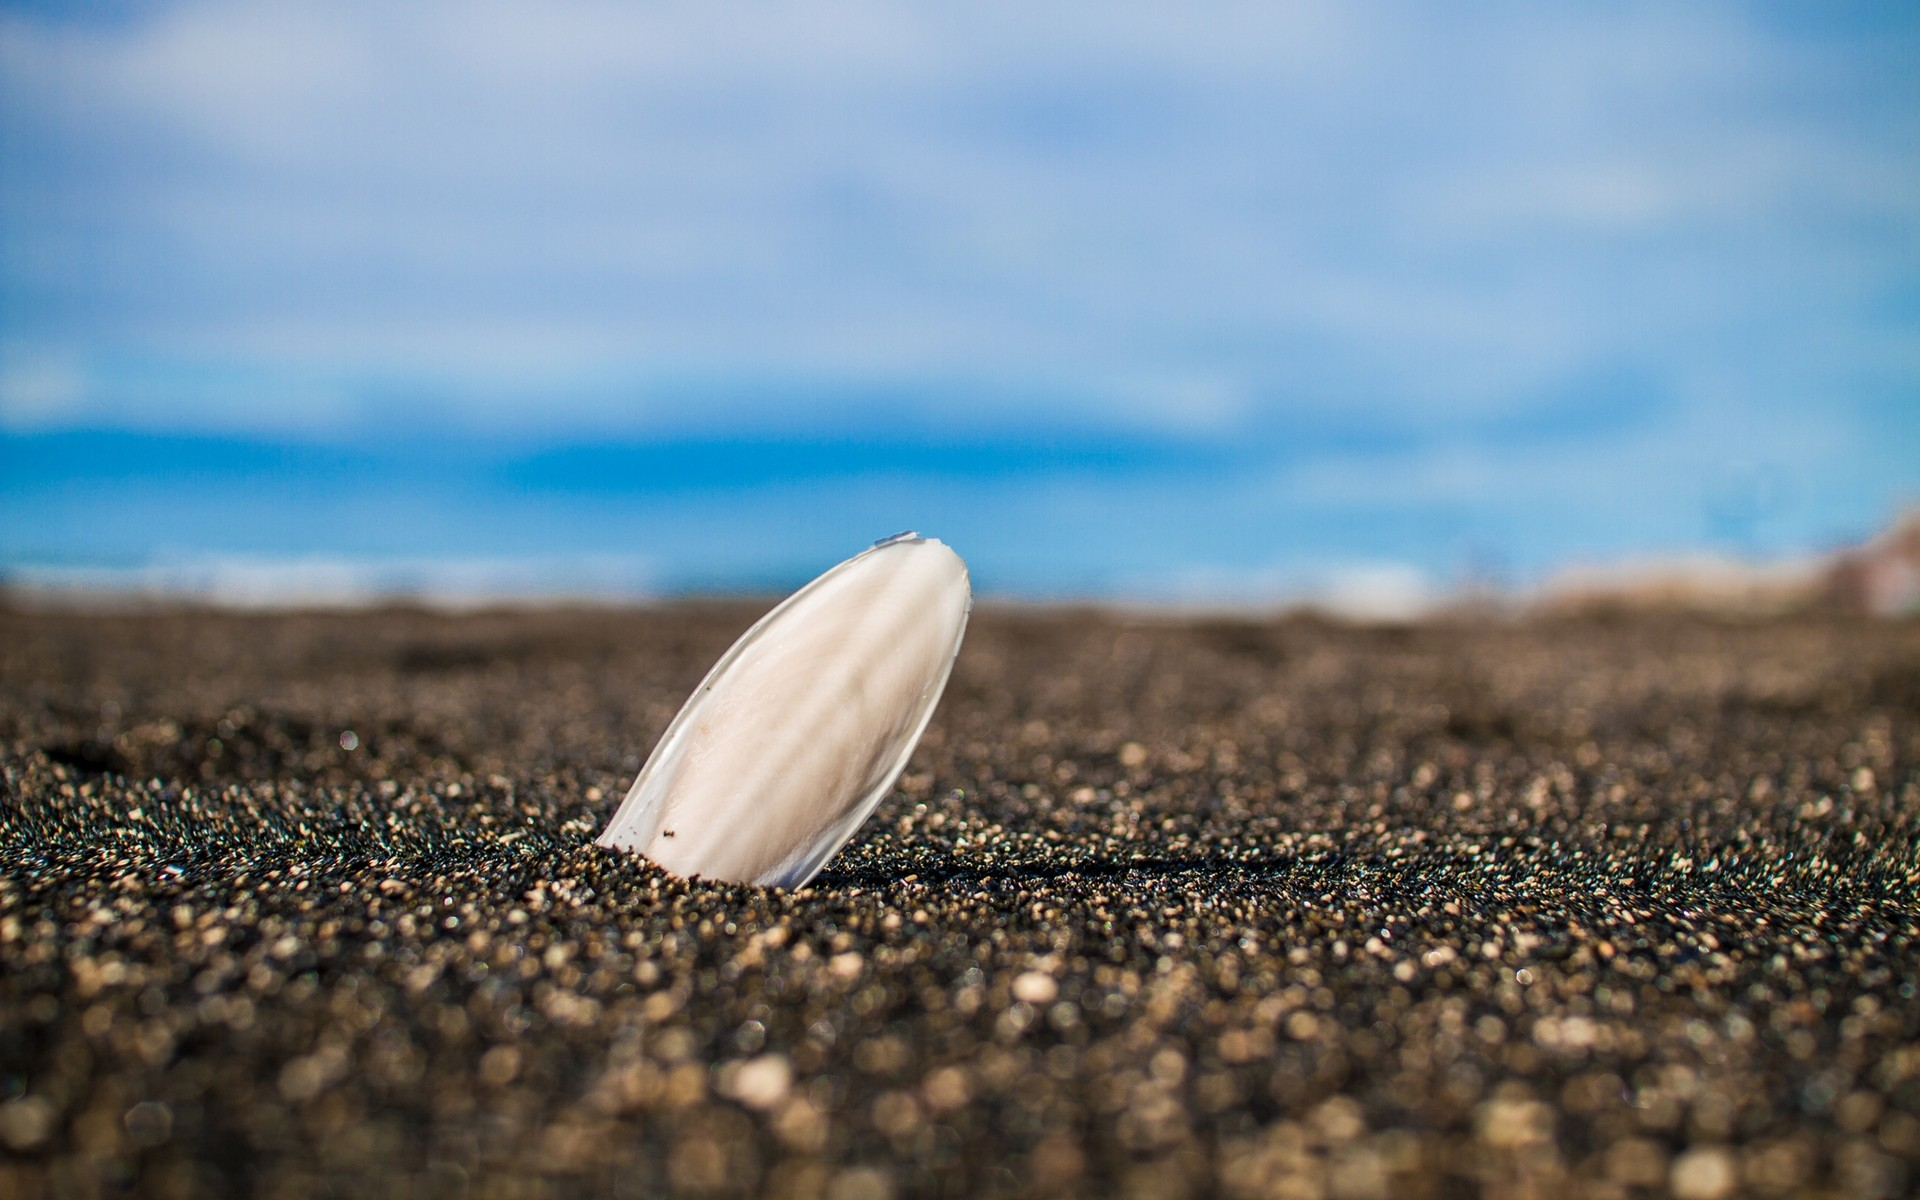 Una concha en la playa - 1920x1200